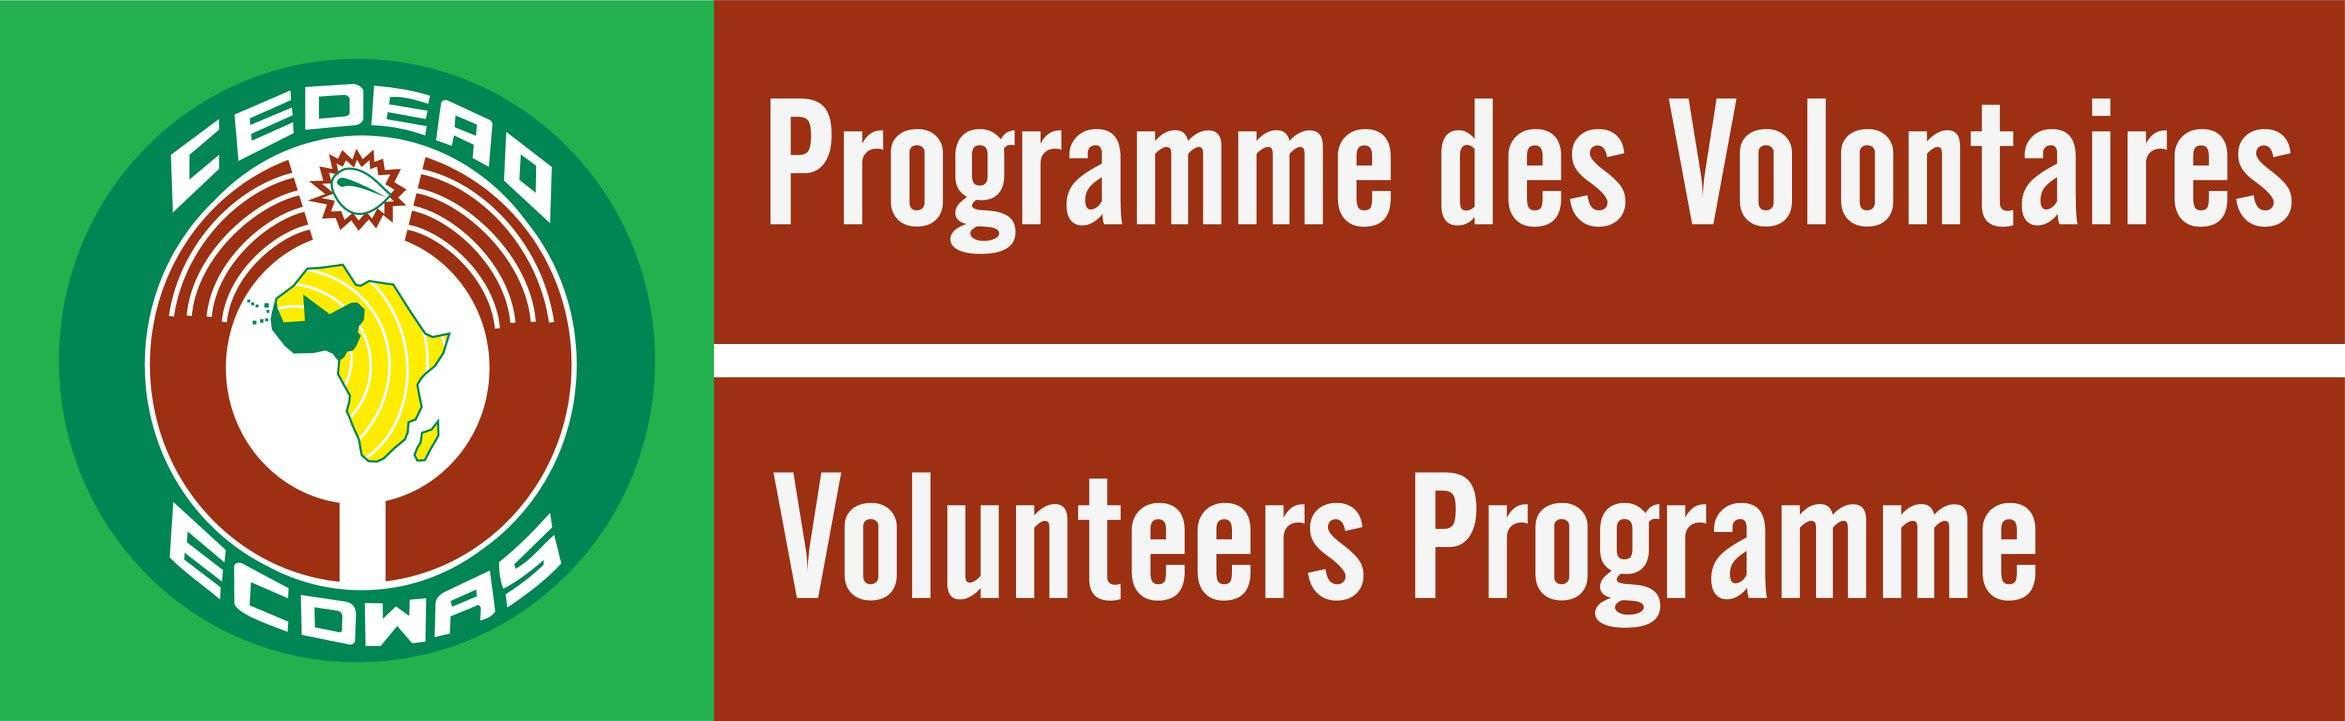 Programme des Volontaires de la CEDEAO